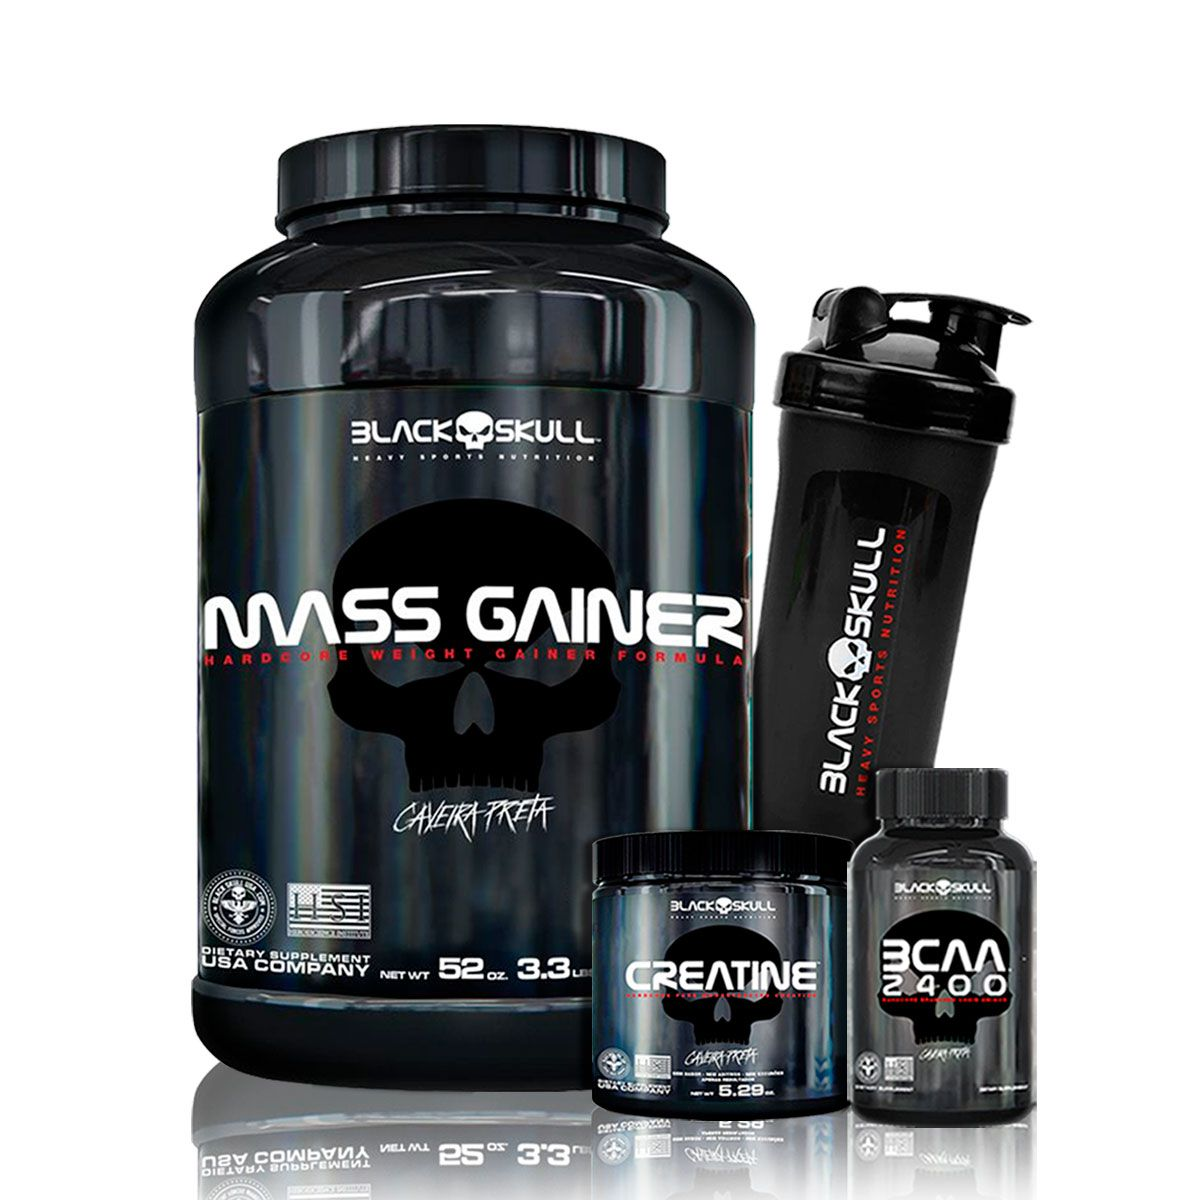 Kit Mass Gainer 1,5kg + BCAA 2400 30 Caps + Creatina 150g + Coq - Black Skull